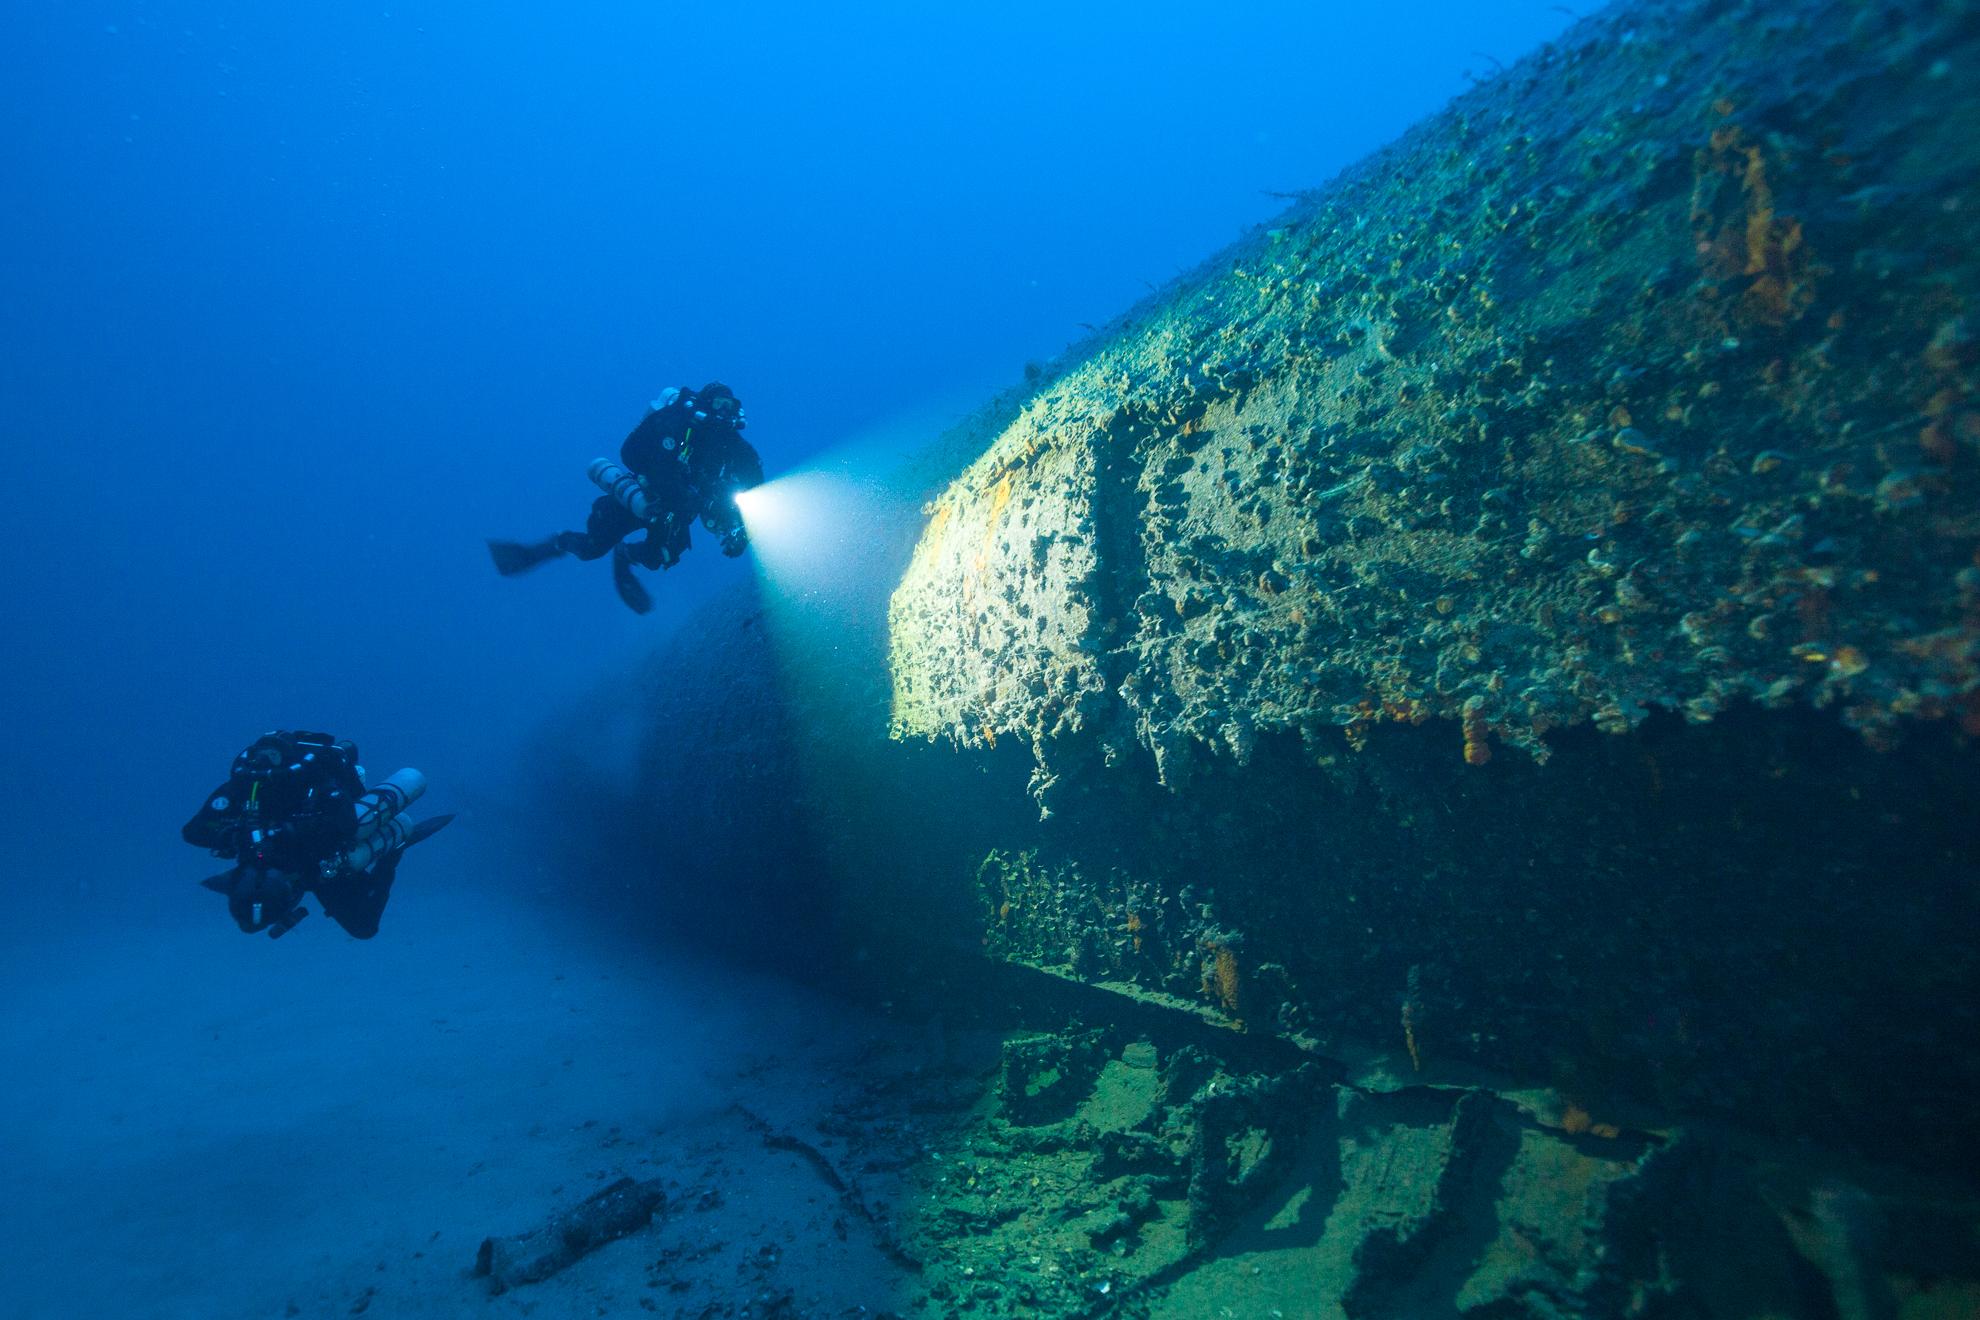 Le protée sous-marin